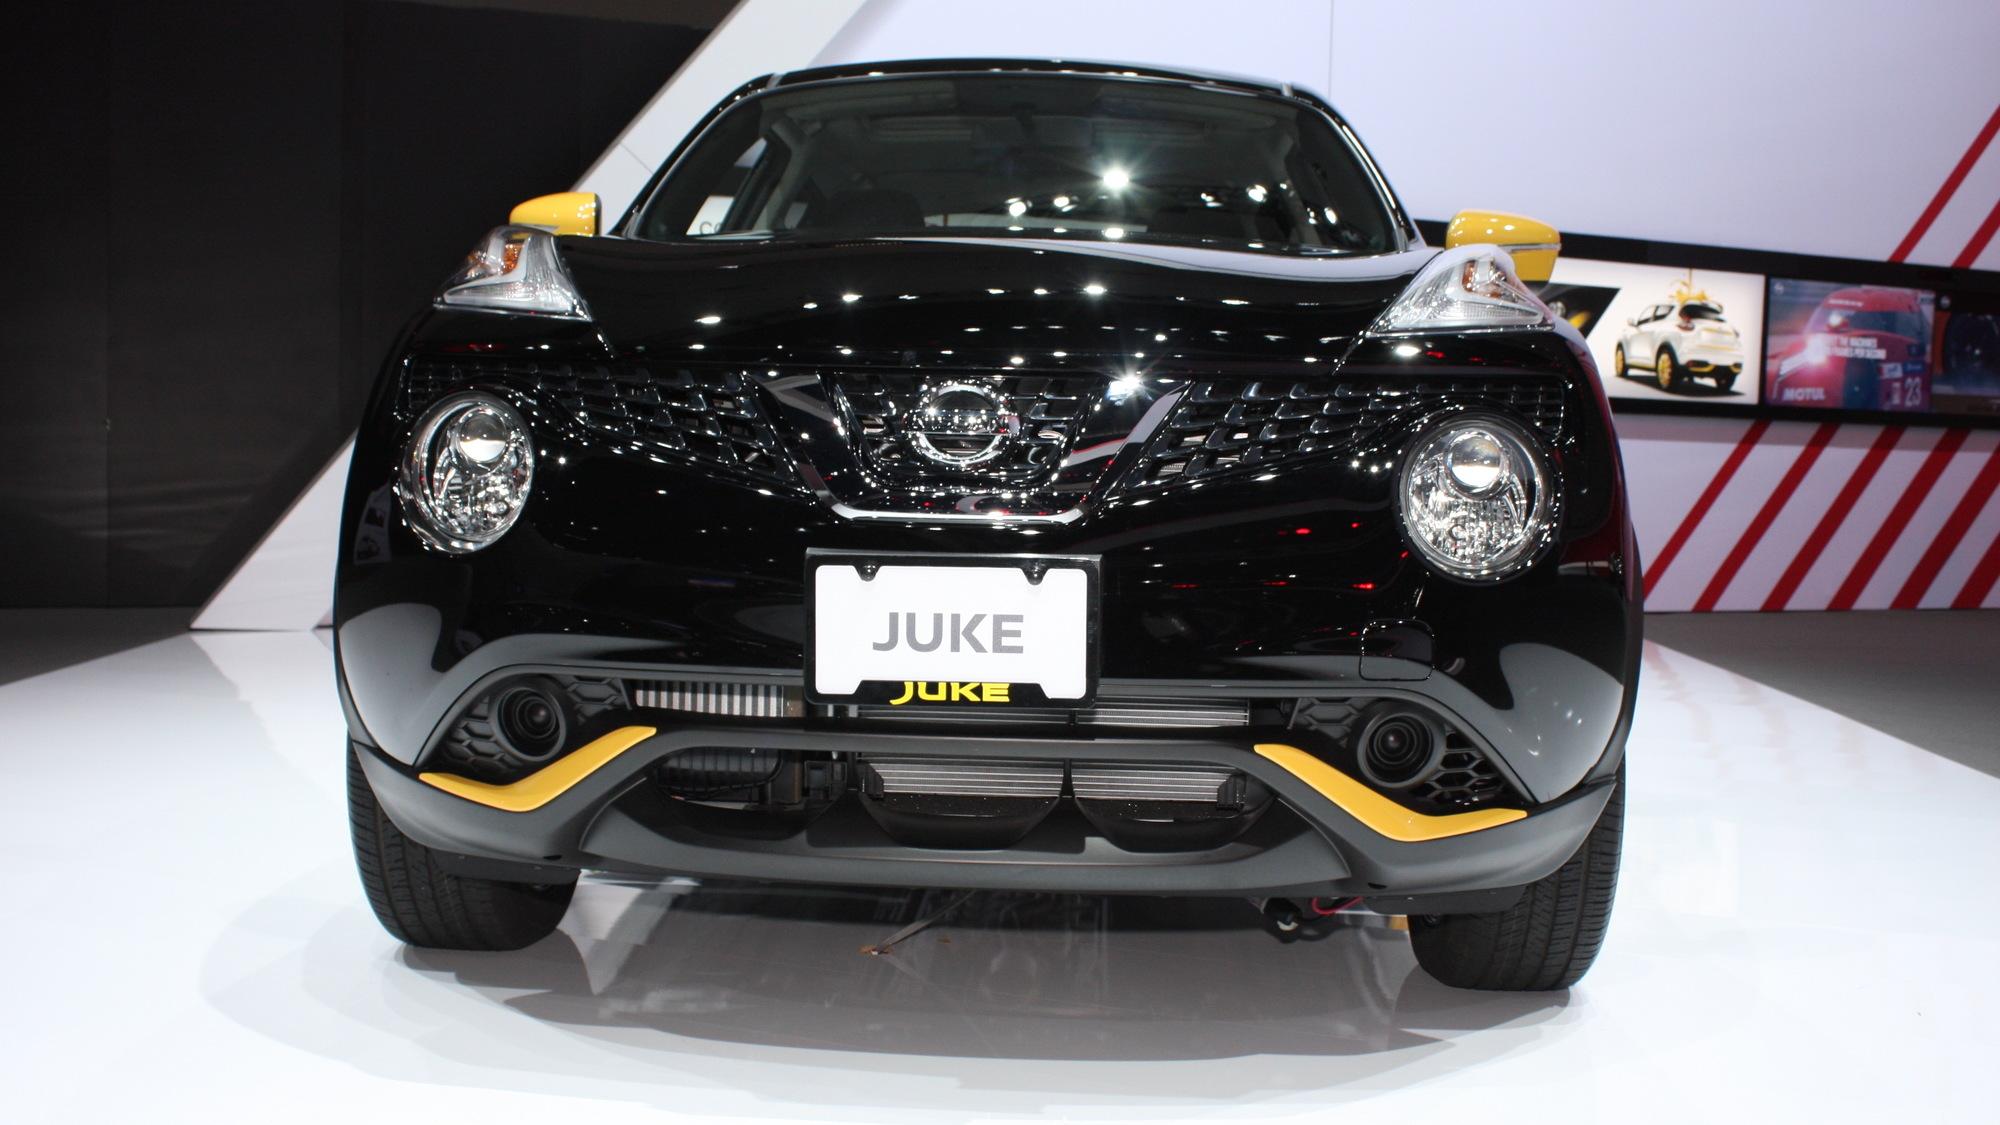 2016 Nissan Juke Stinger, 2015 Los Angeles Auto Show